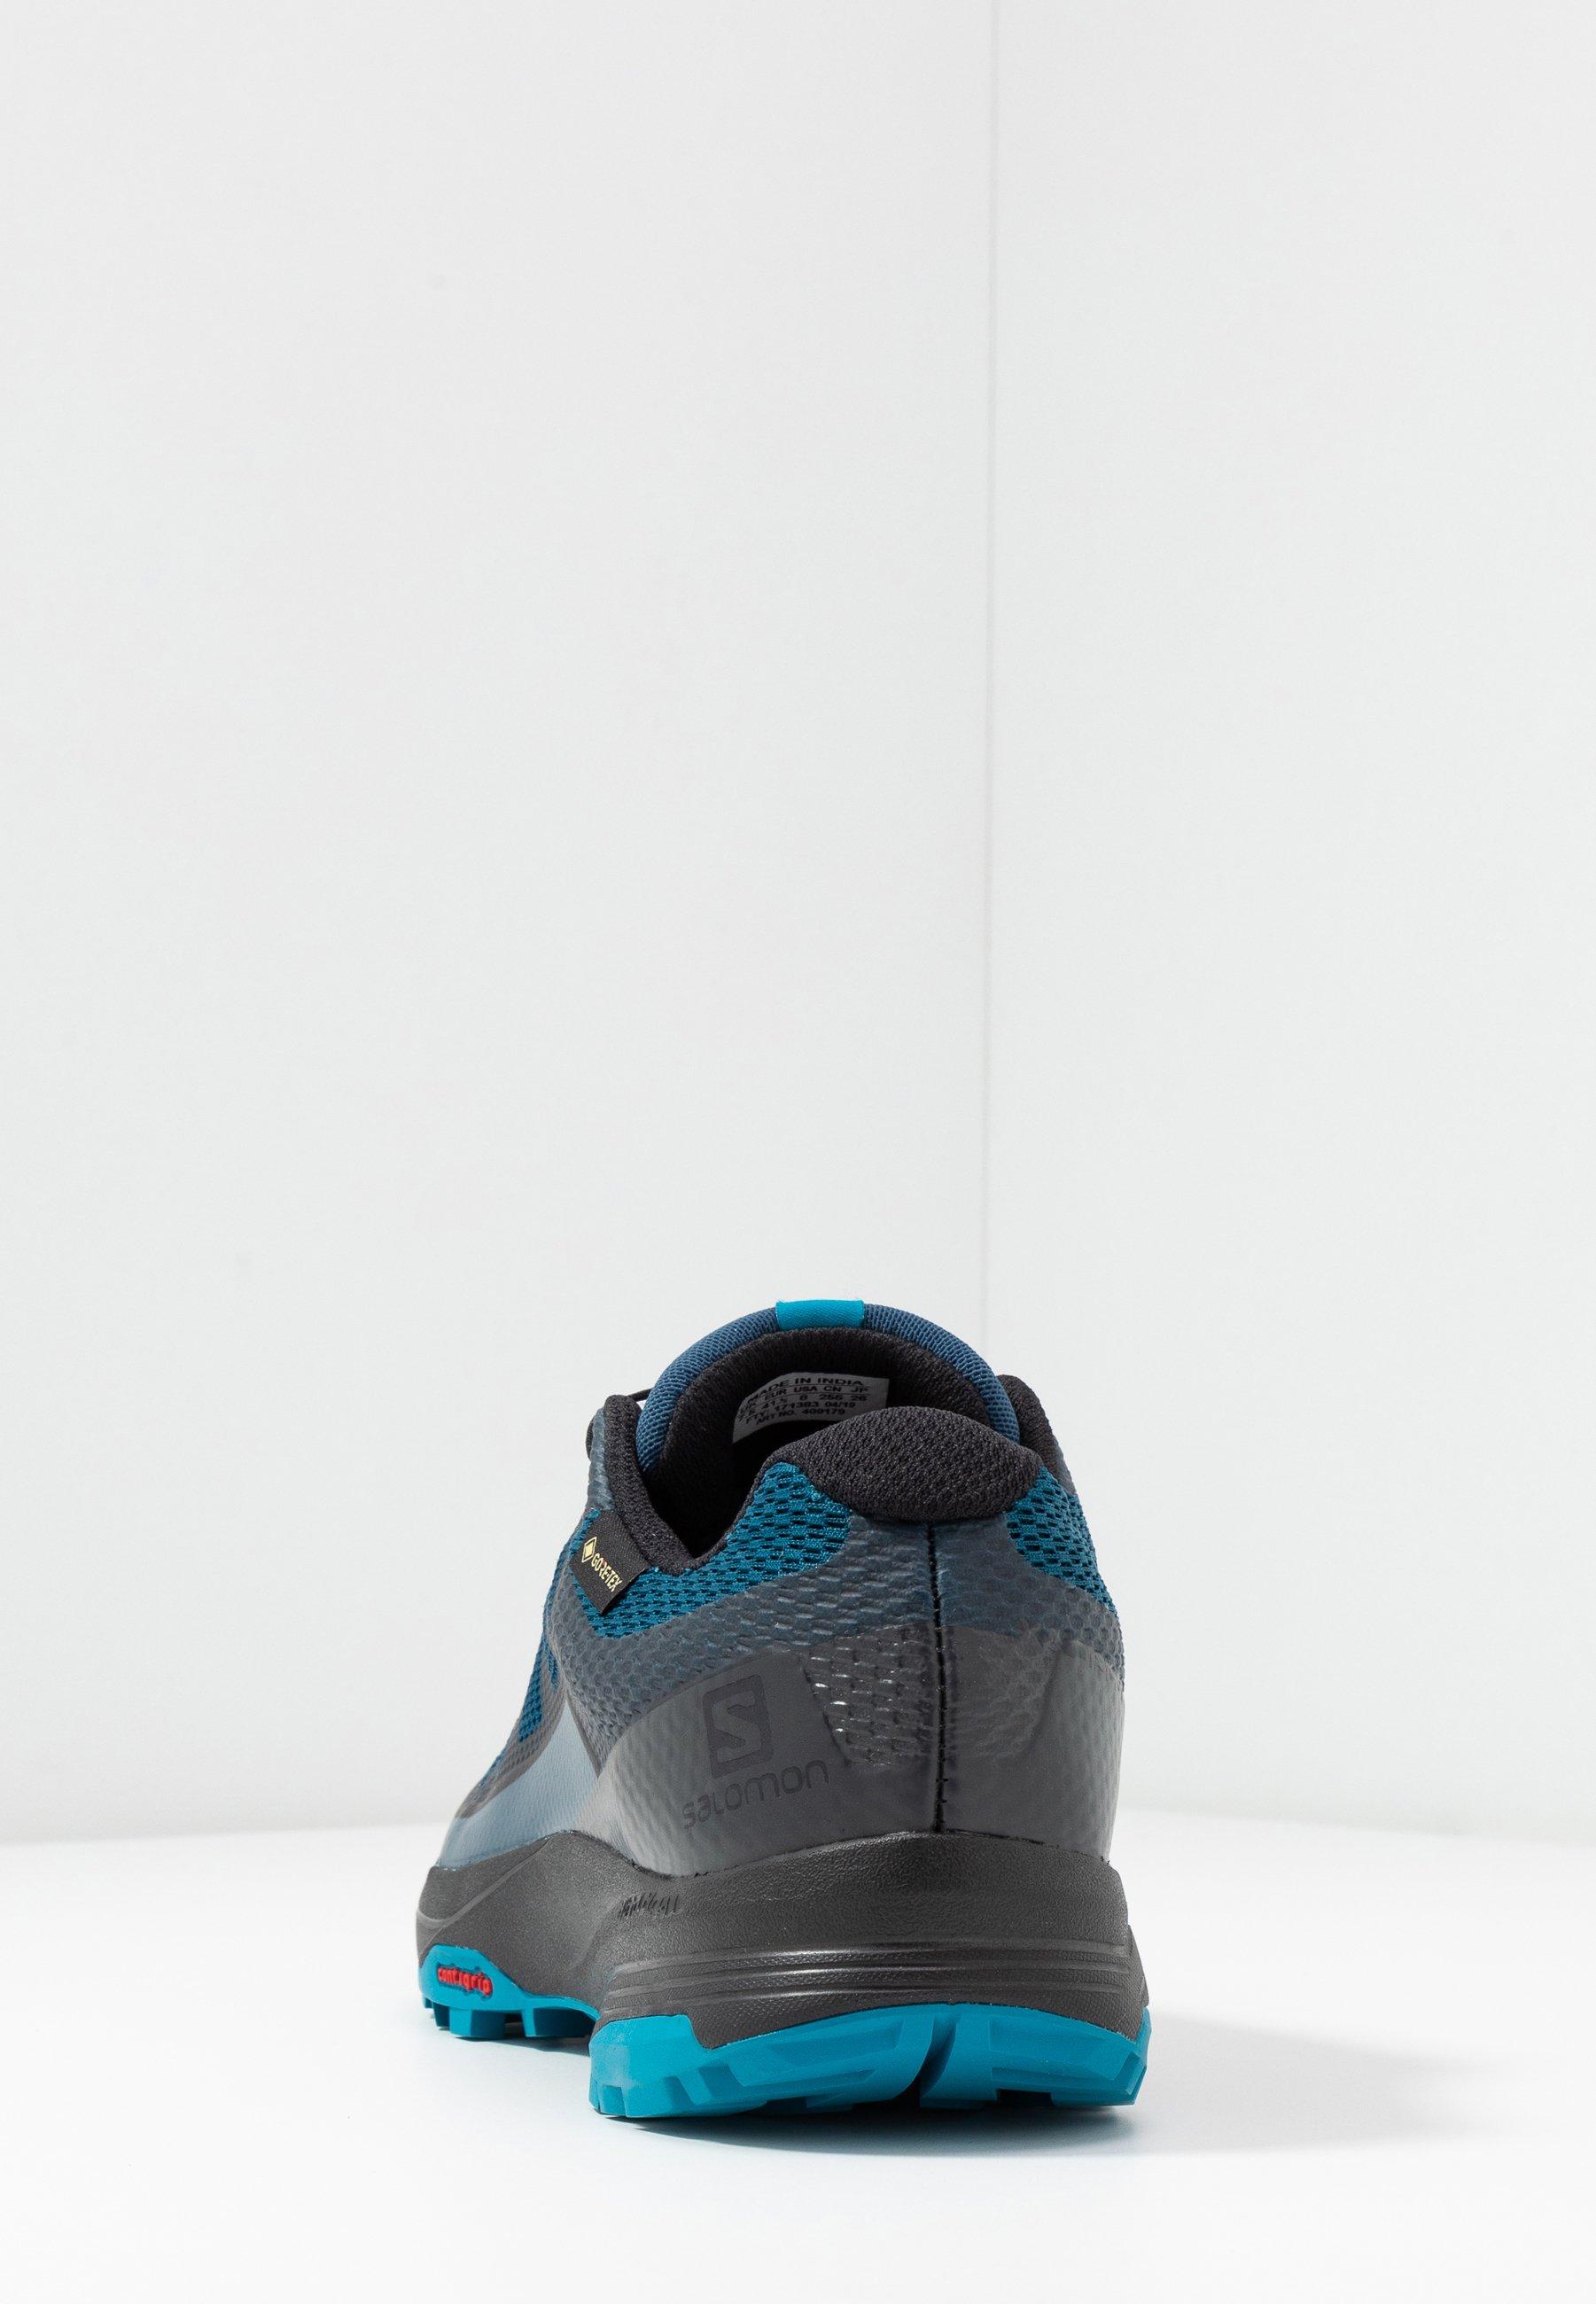 Salomon Xa Discovery Gtx - Chaussures De Running Poseidon/black/fjord Blue K3TUnta